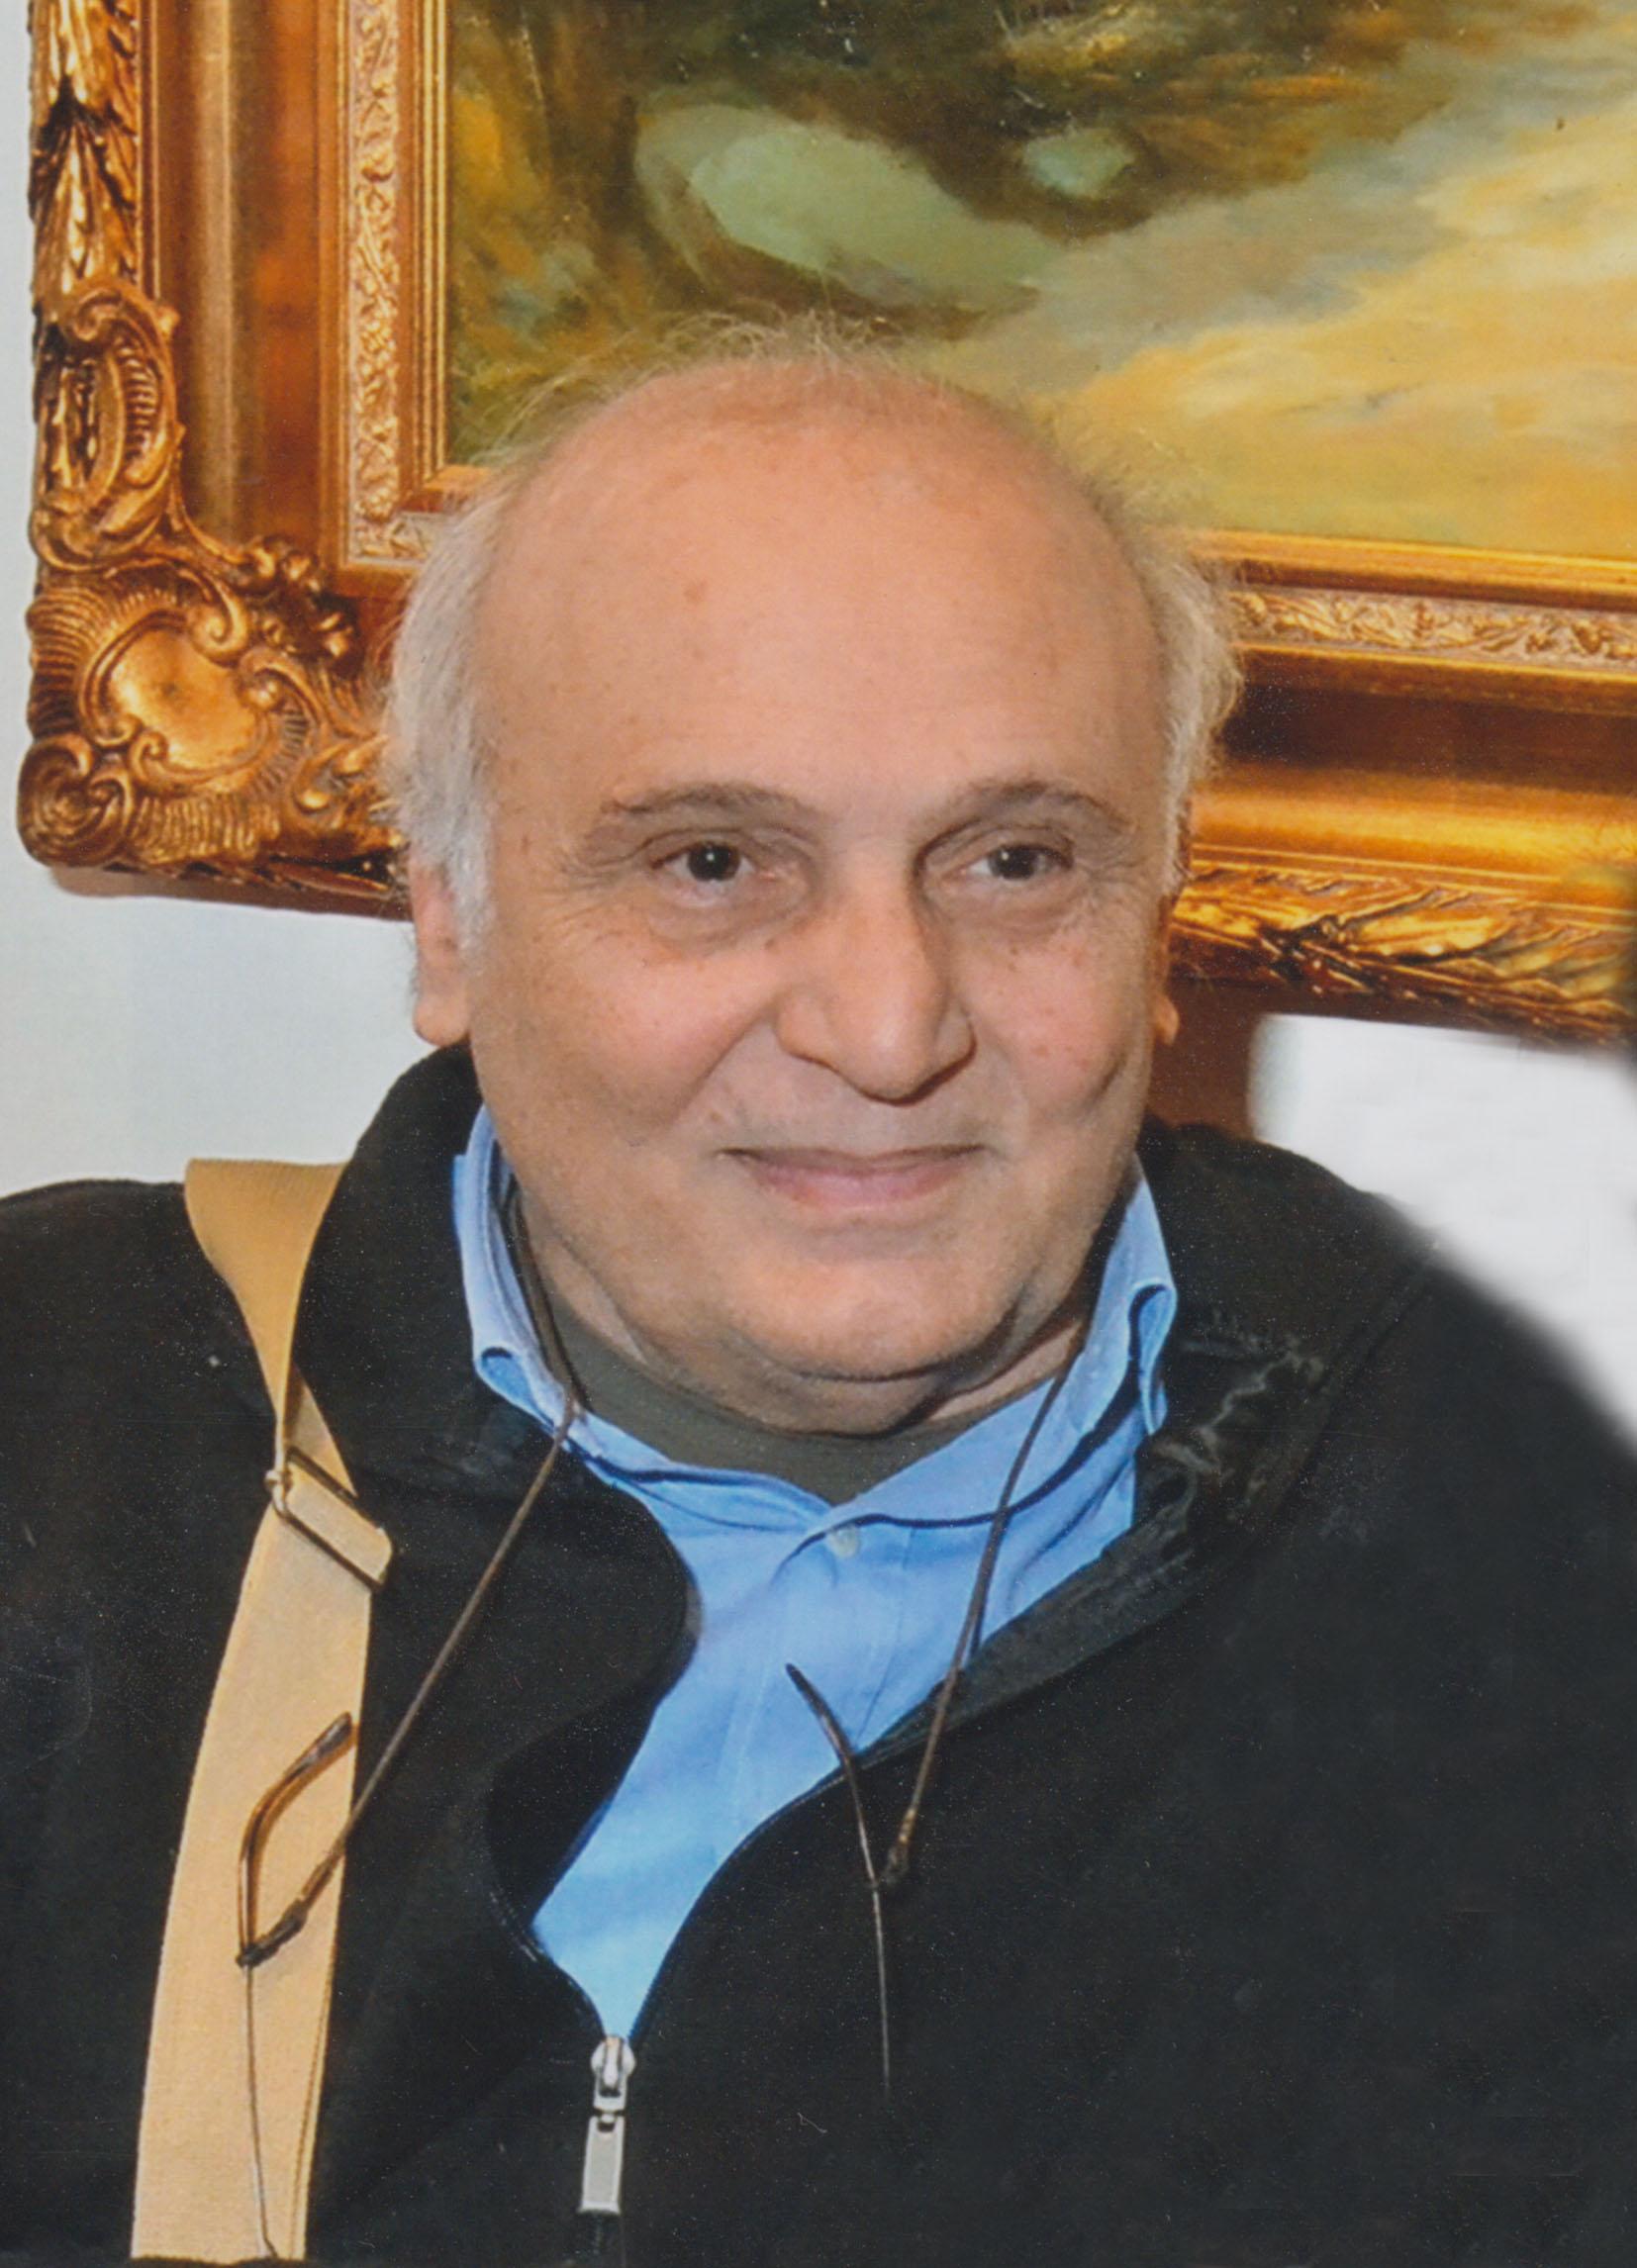 Onofrio Casimirri